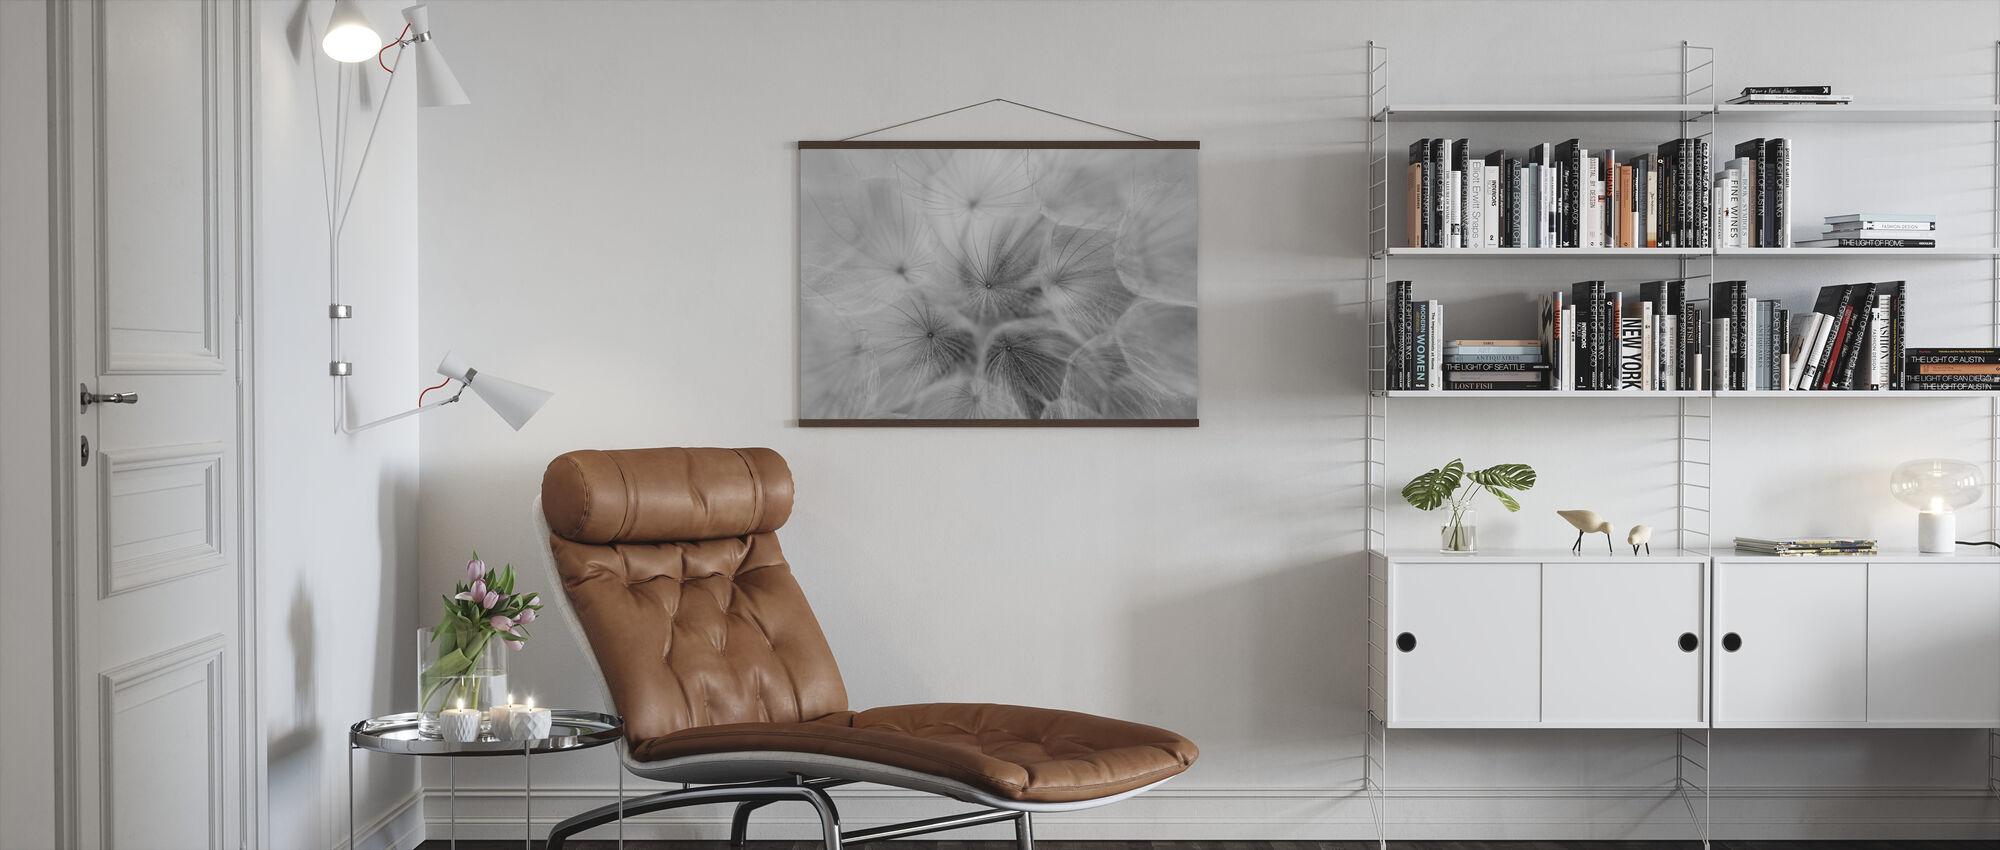 Salsify - Poster - Living Room